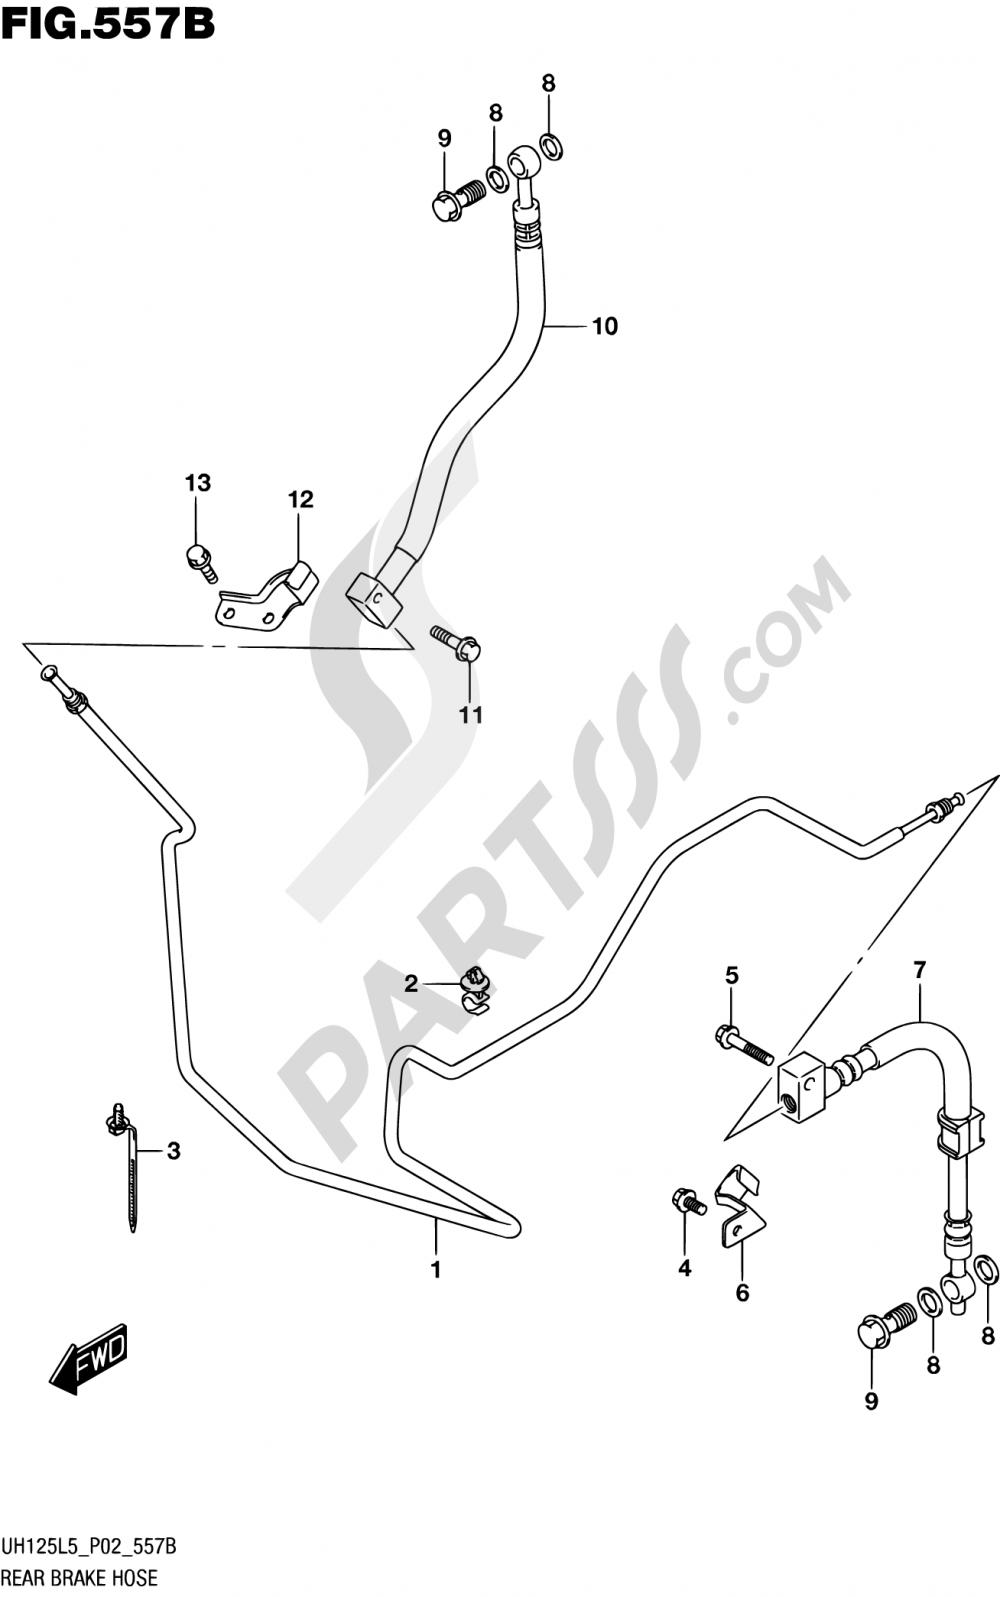 557B - REAR BRAKE HOSE (UH125L5 P04) Suzuki BURGMAN UH125A 2015